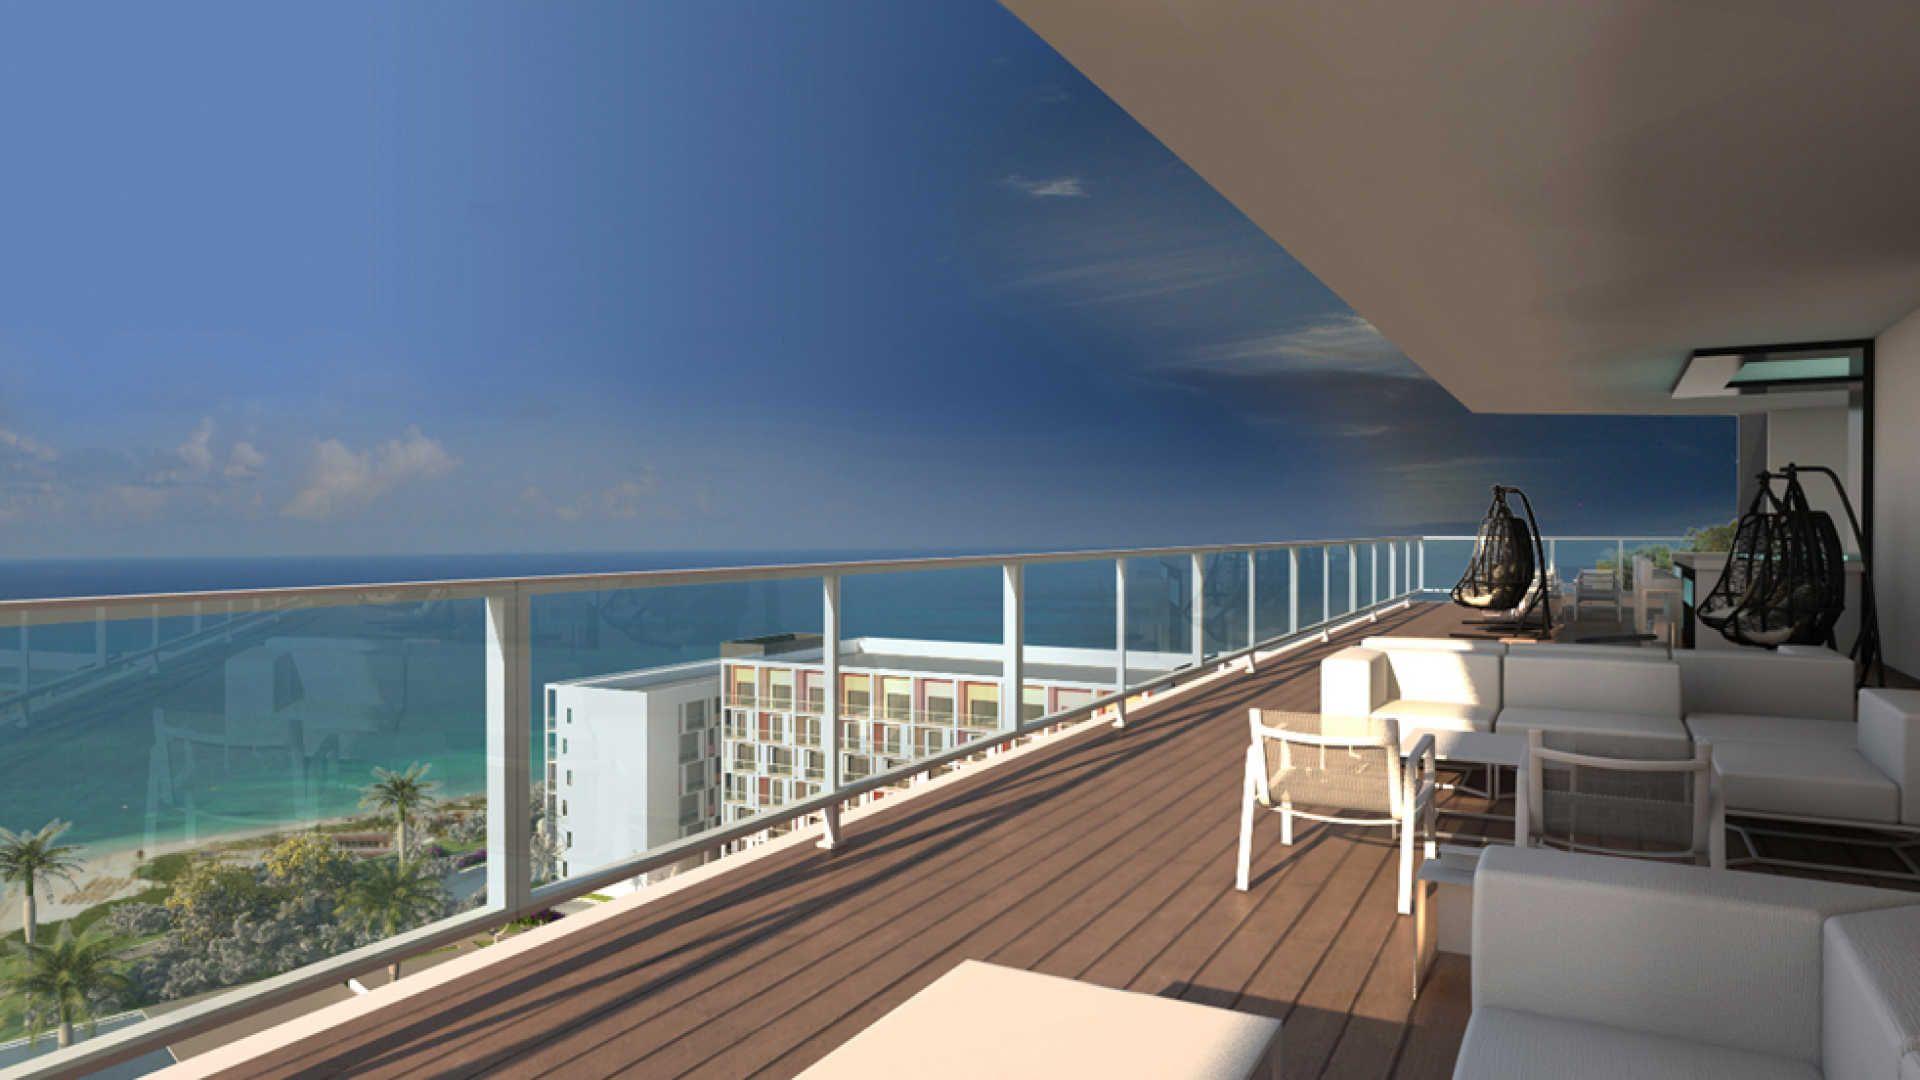 Book iberostar bella vista a luxury hotel in varadero cuba